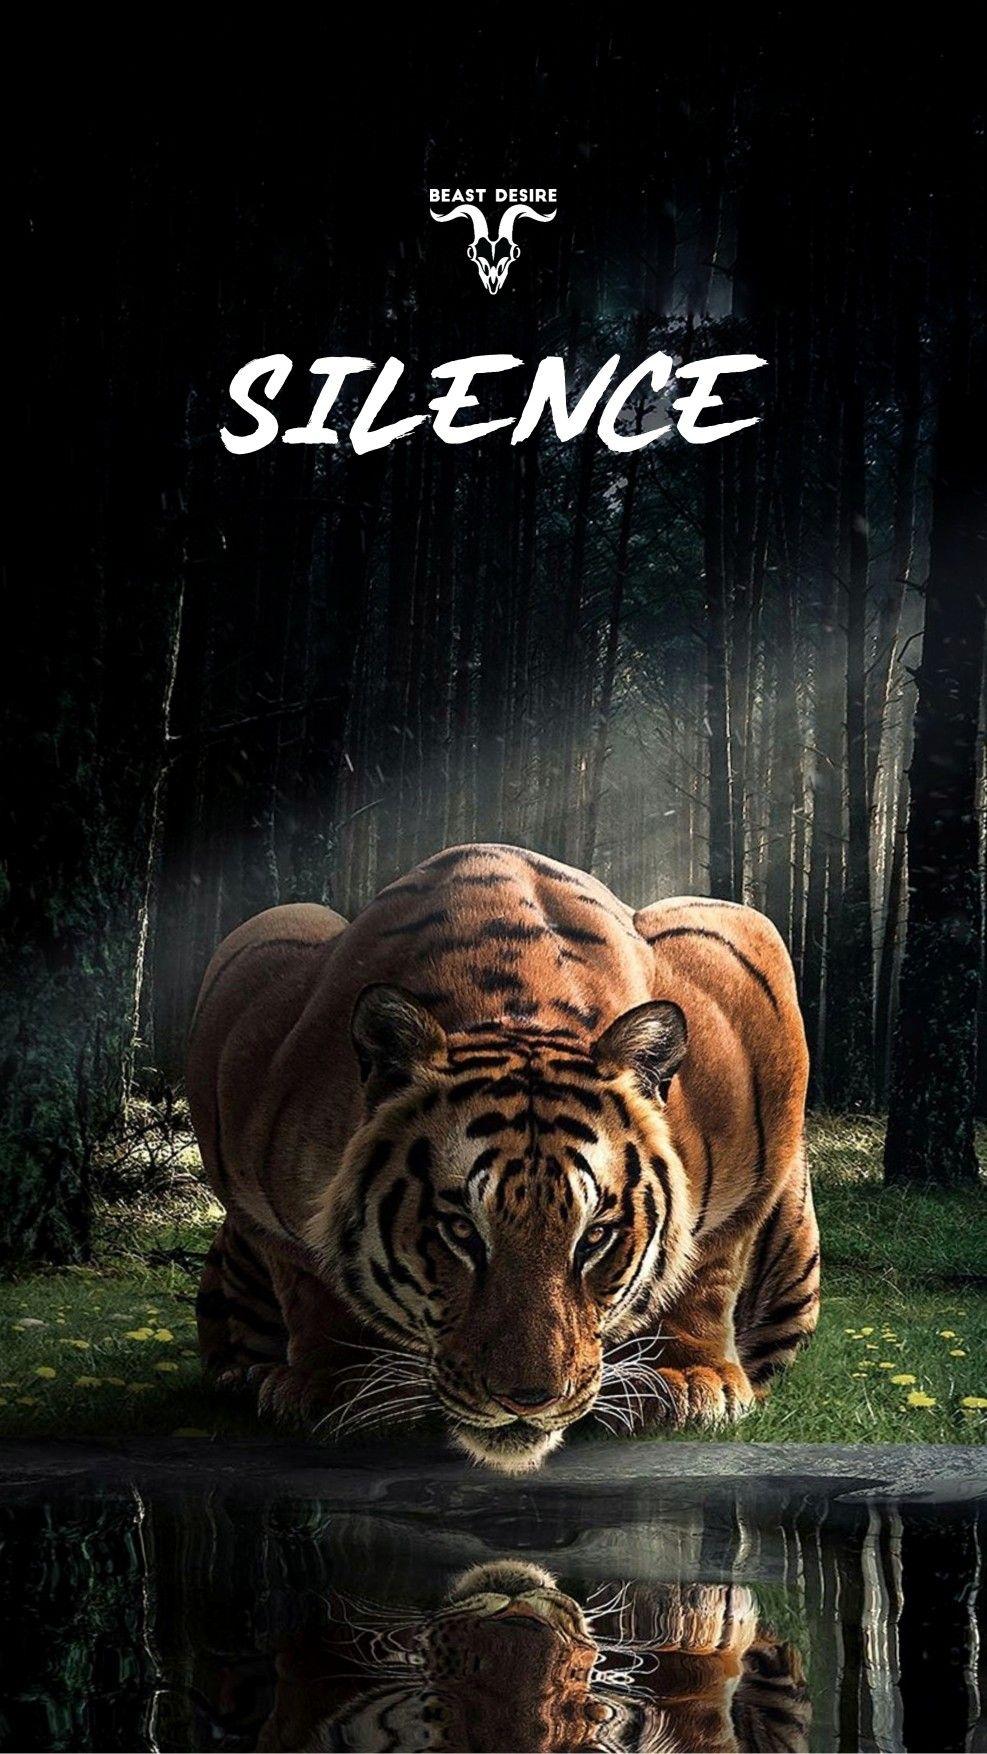 Beast Desire Wallpaper Motivational Quotes Wallpaper Hd Wallpaper Quotes Wild Animals Photography